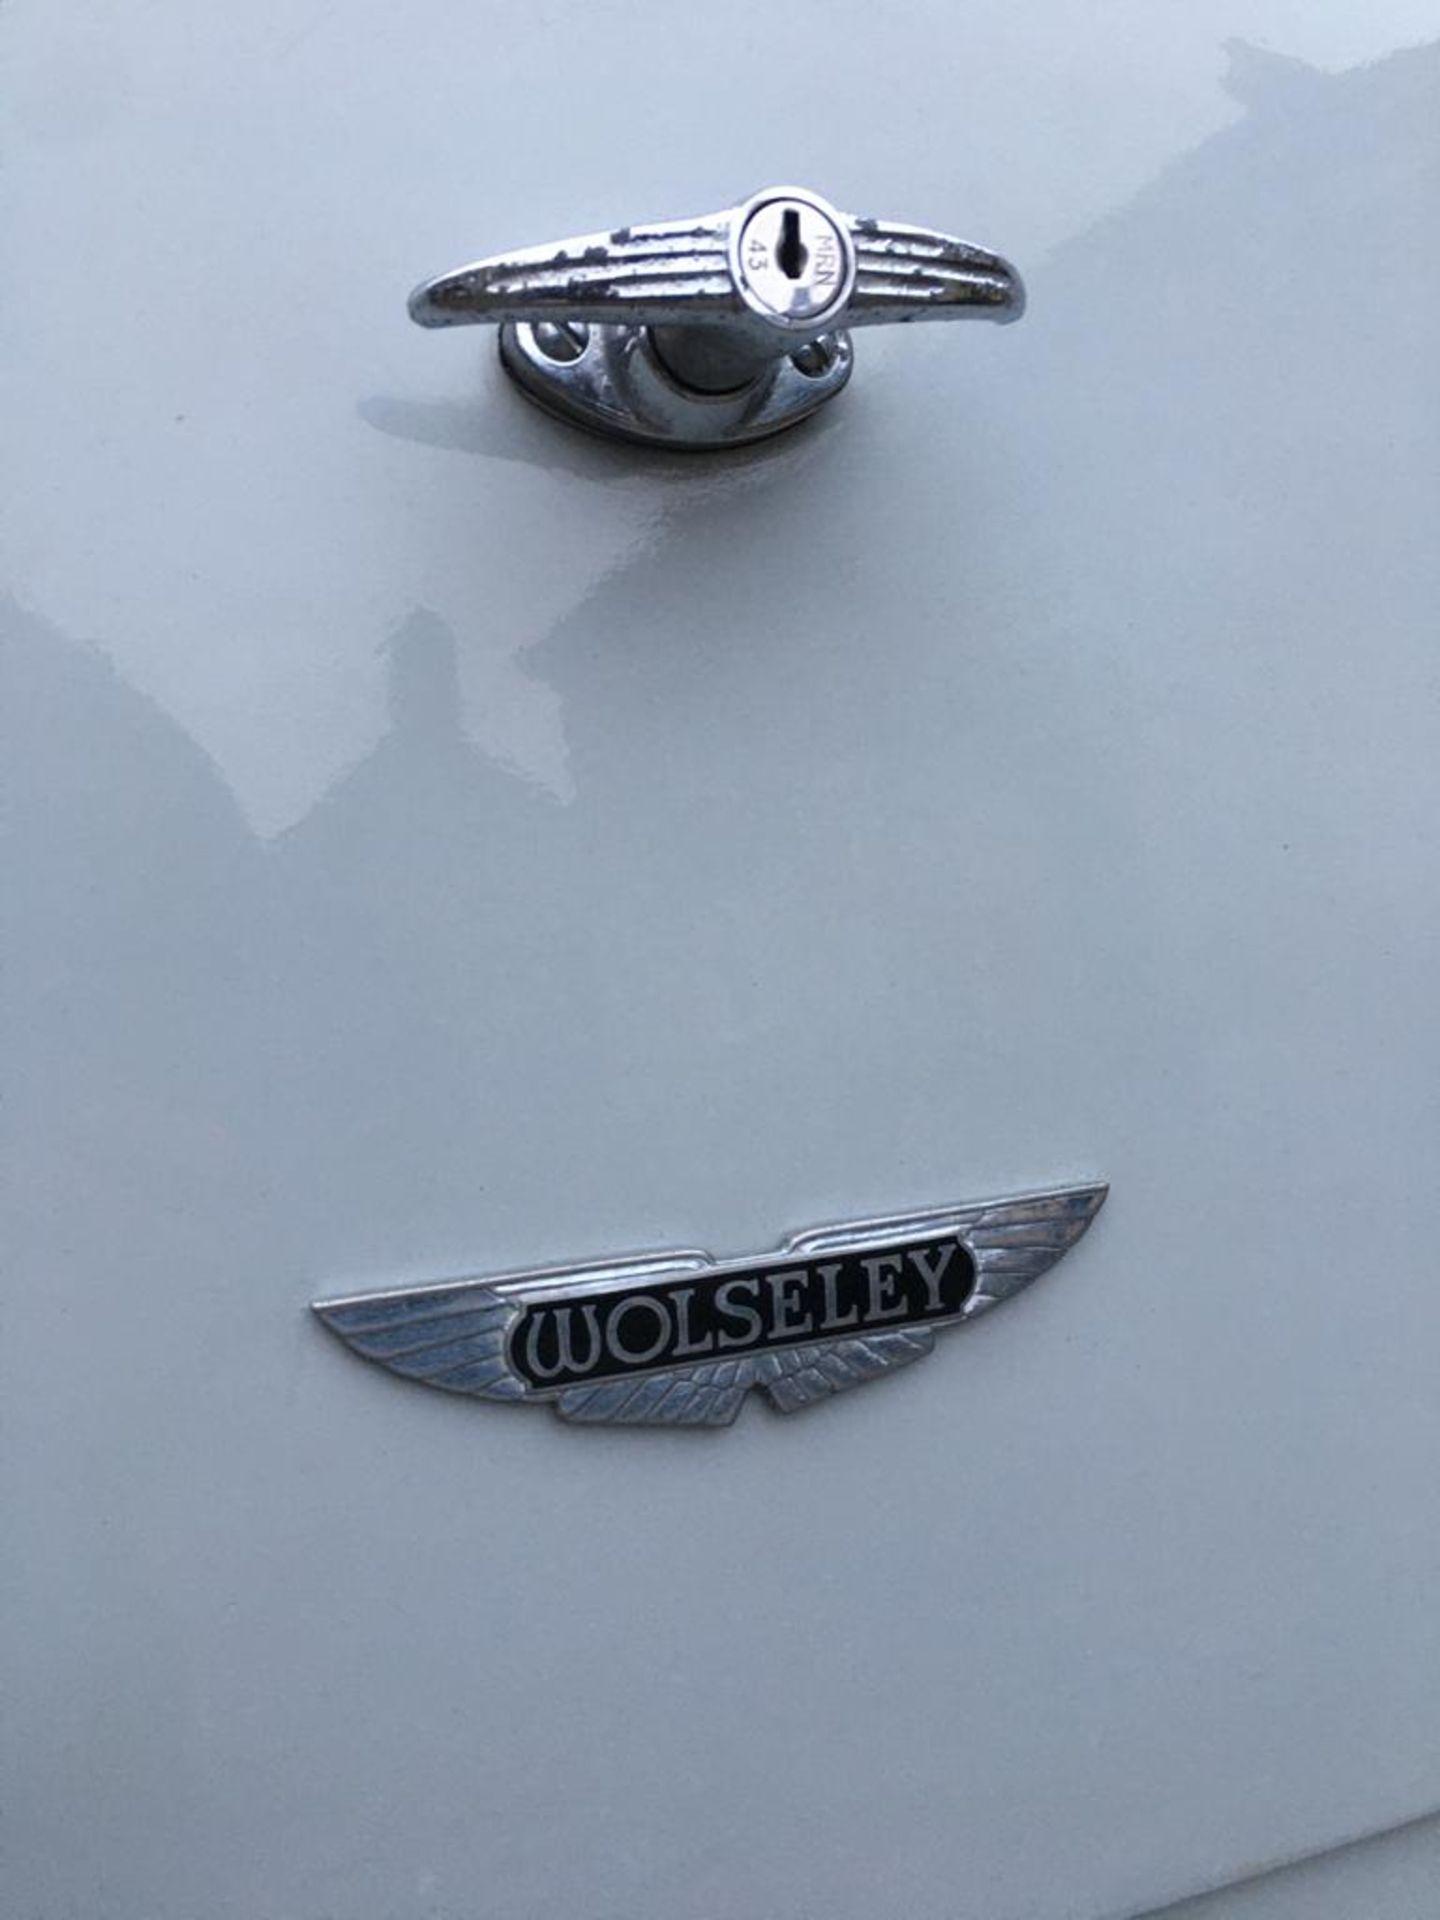 1938 WOLSELEY 25 CLASSIC 4.0 - Image 16 of 35